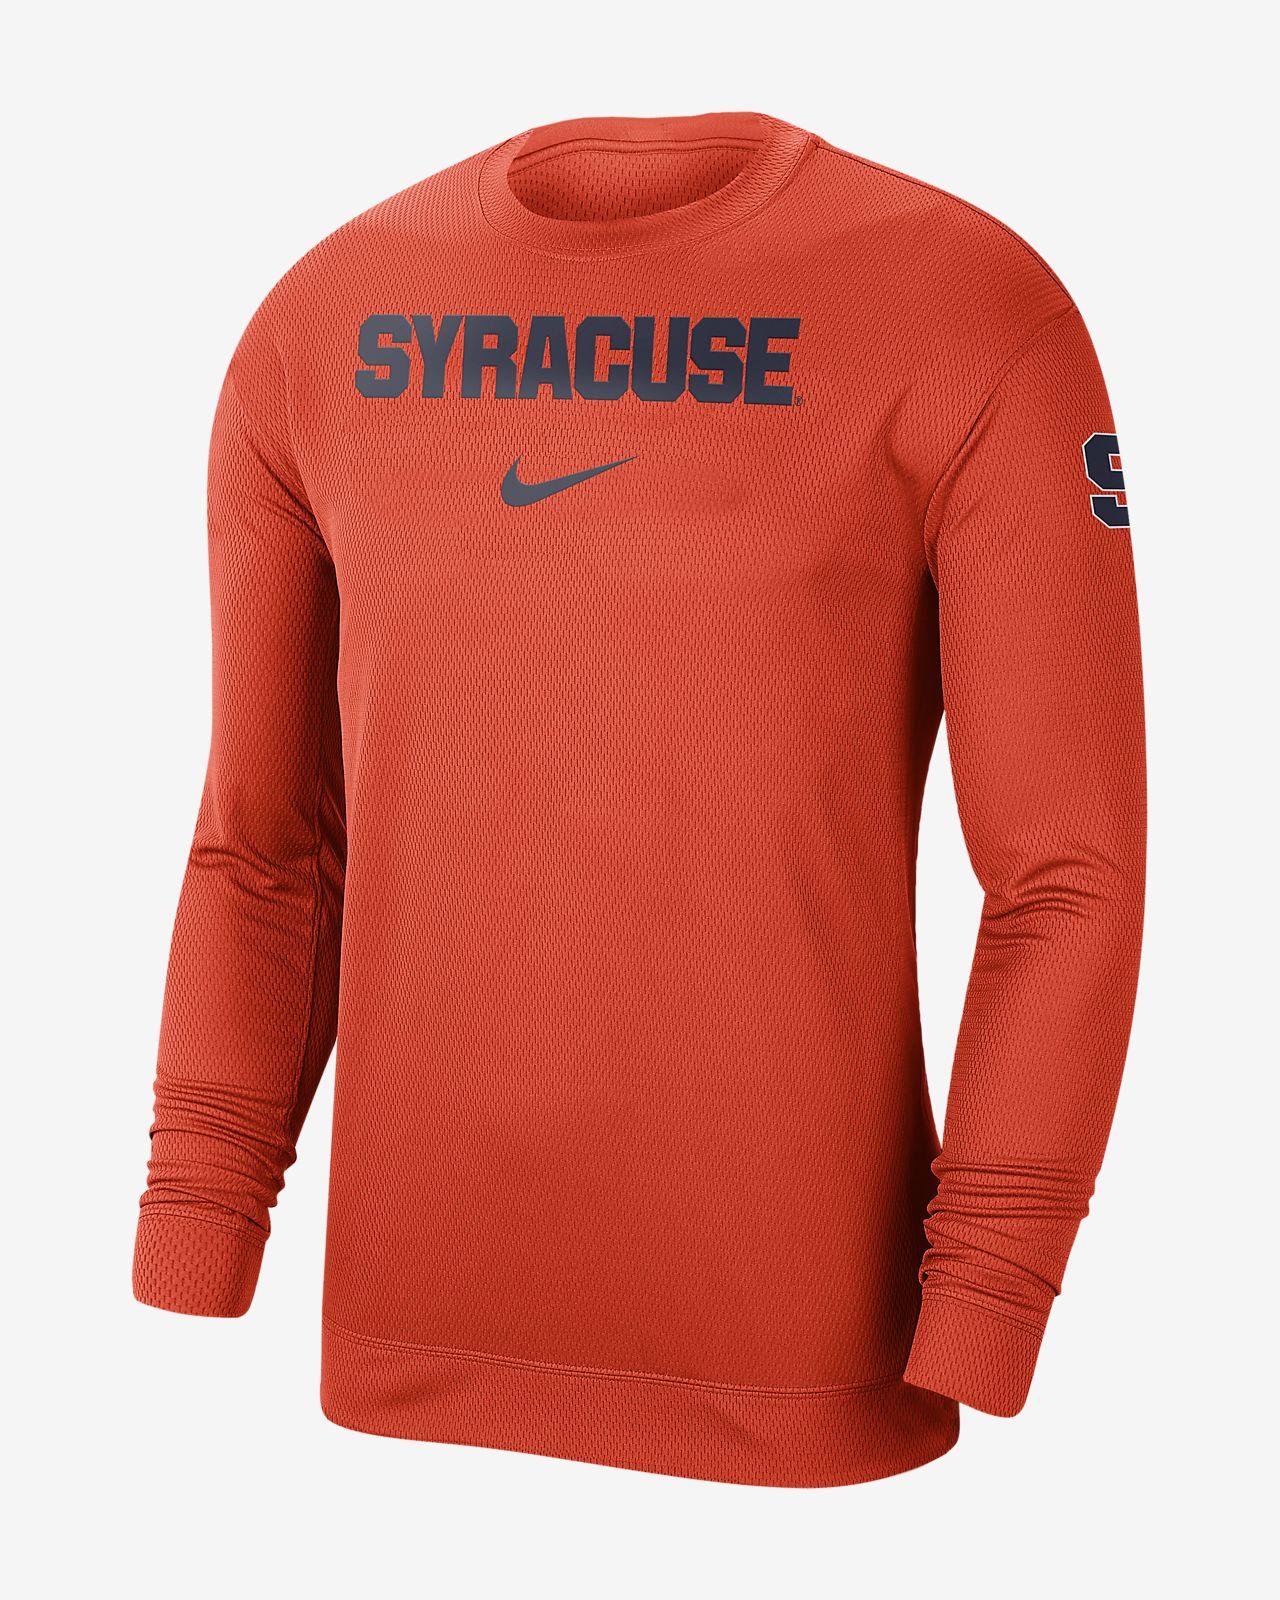 Nike College Dri-FIT Spotlight (Syracuse) Men's Long-Sleeve Top